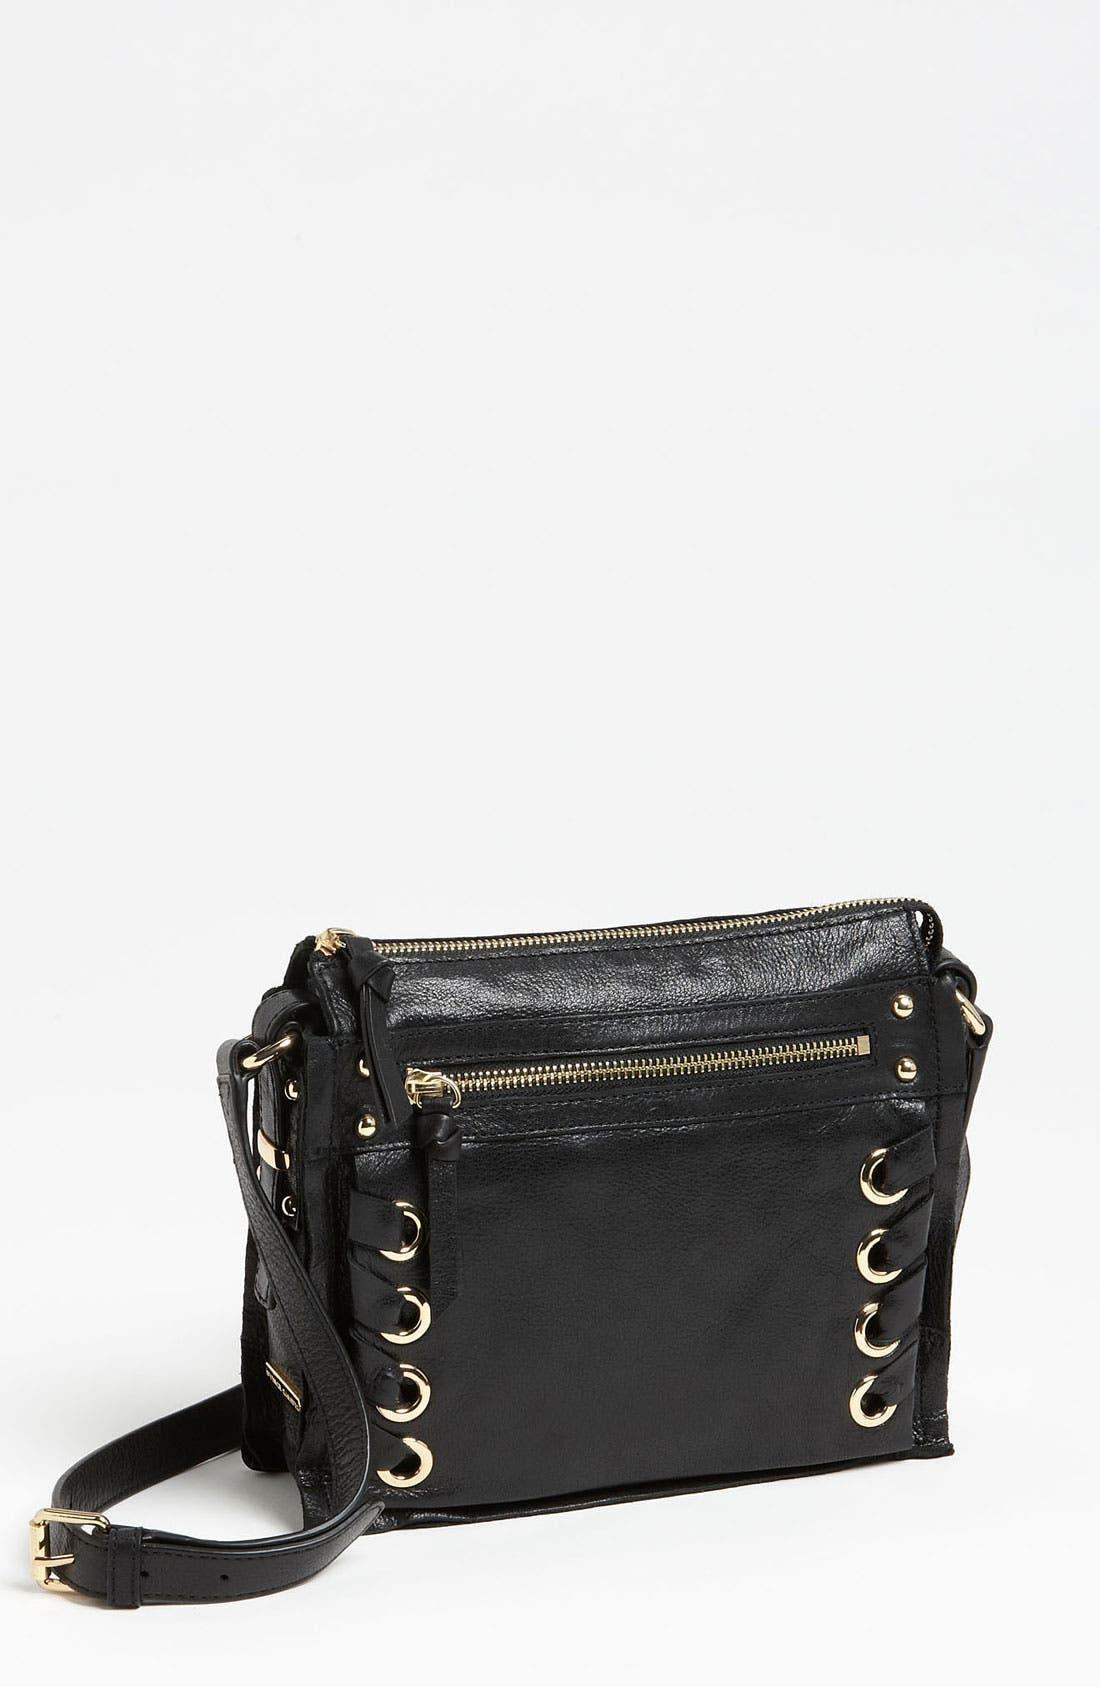 Main Image - Vince Camuto 'Mica' Crossbody Bag